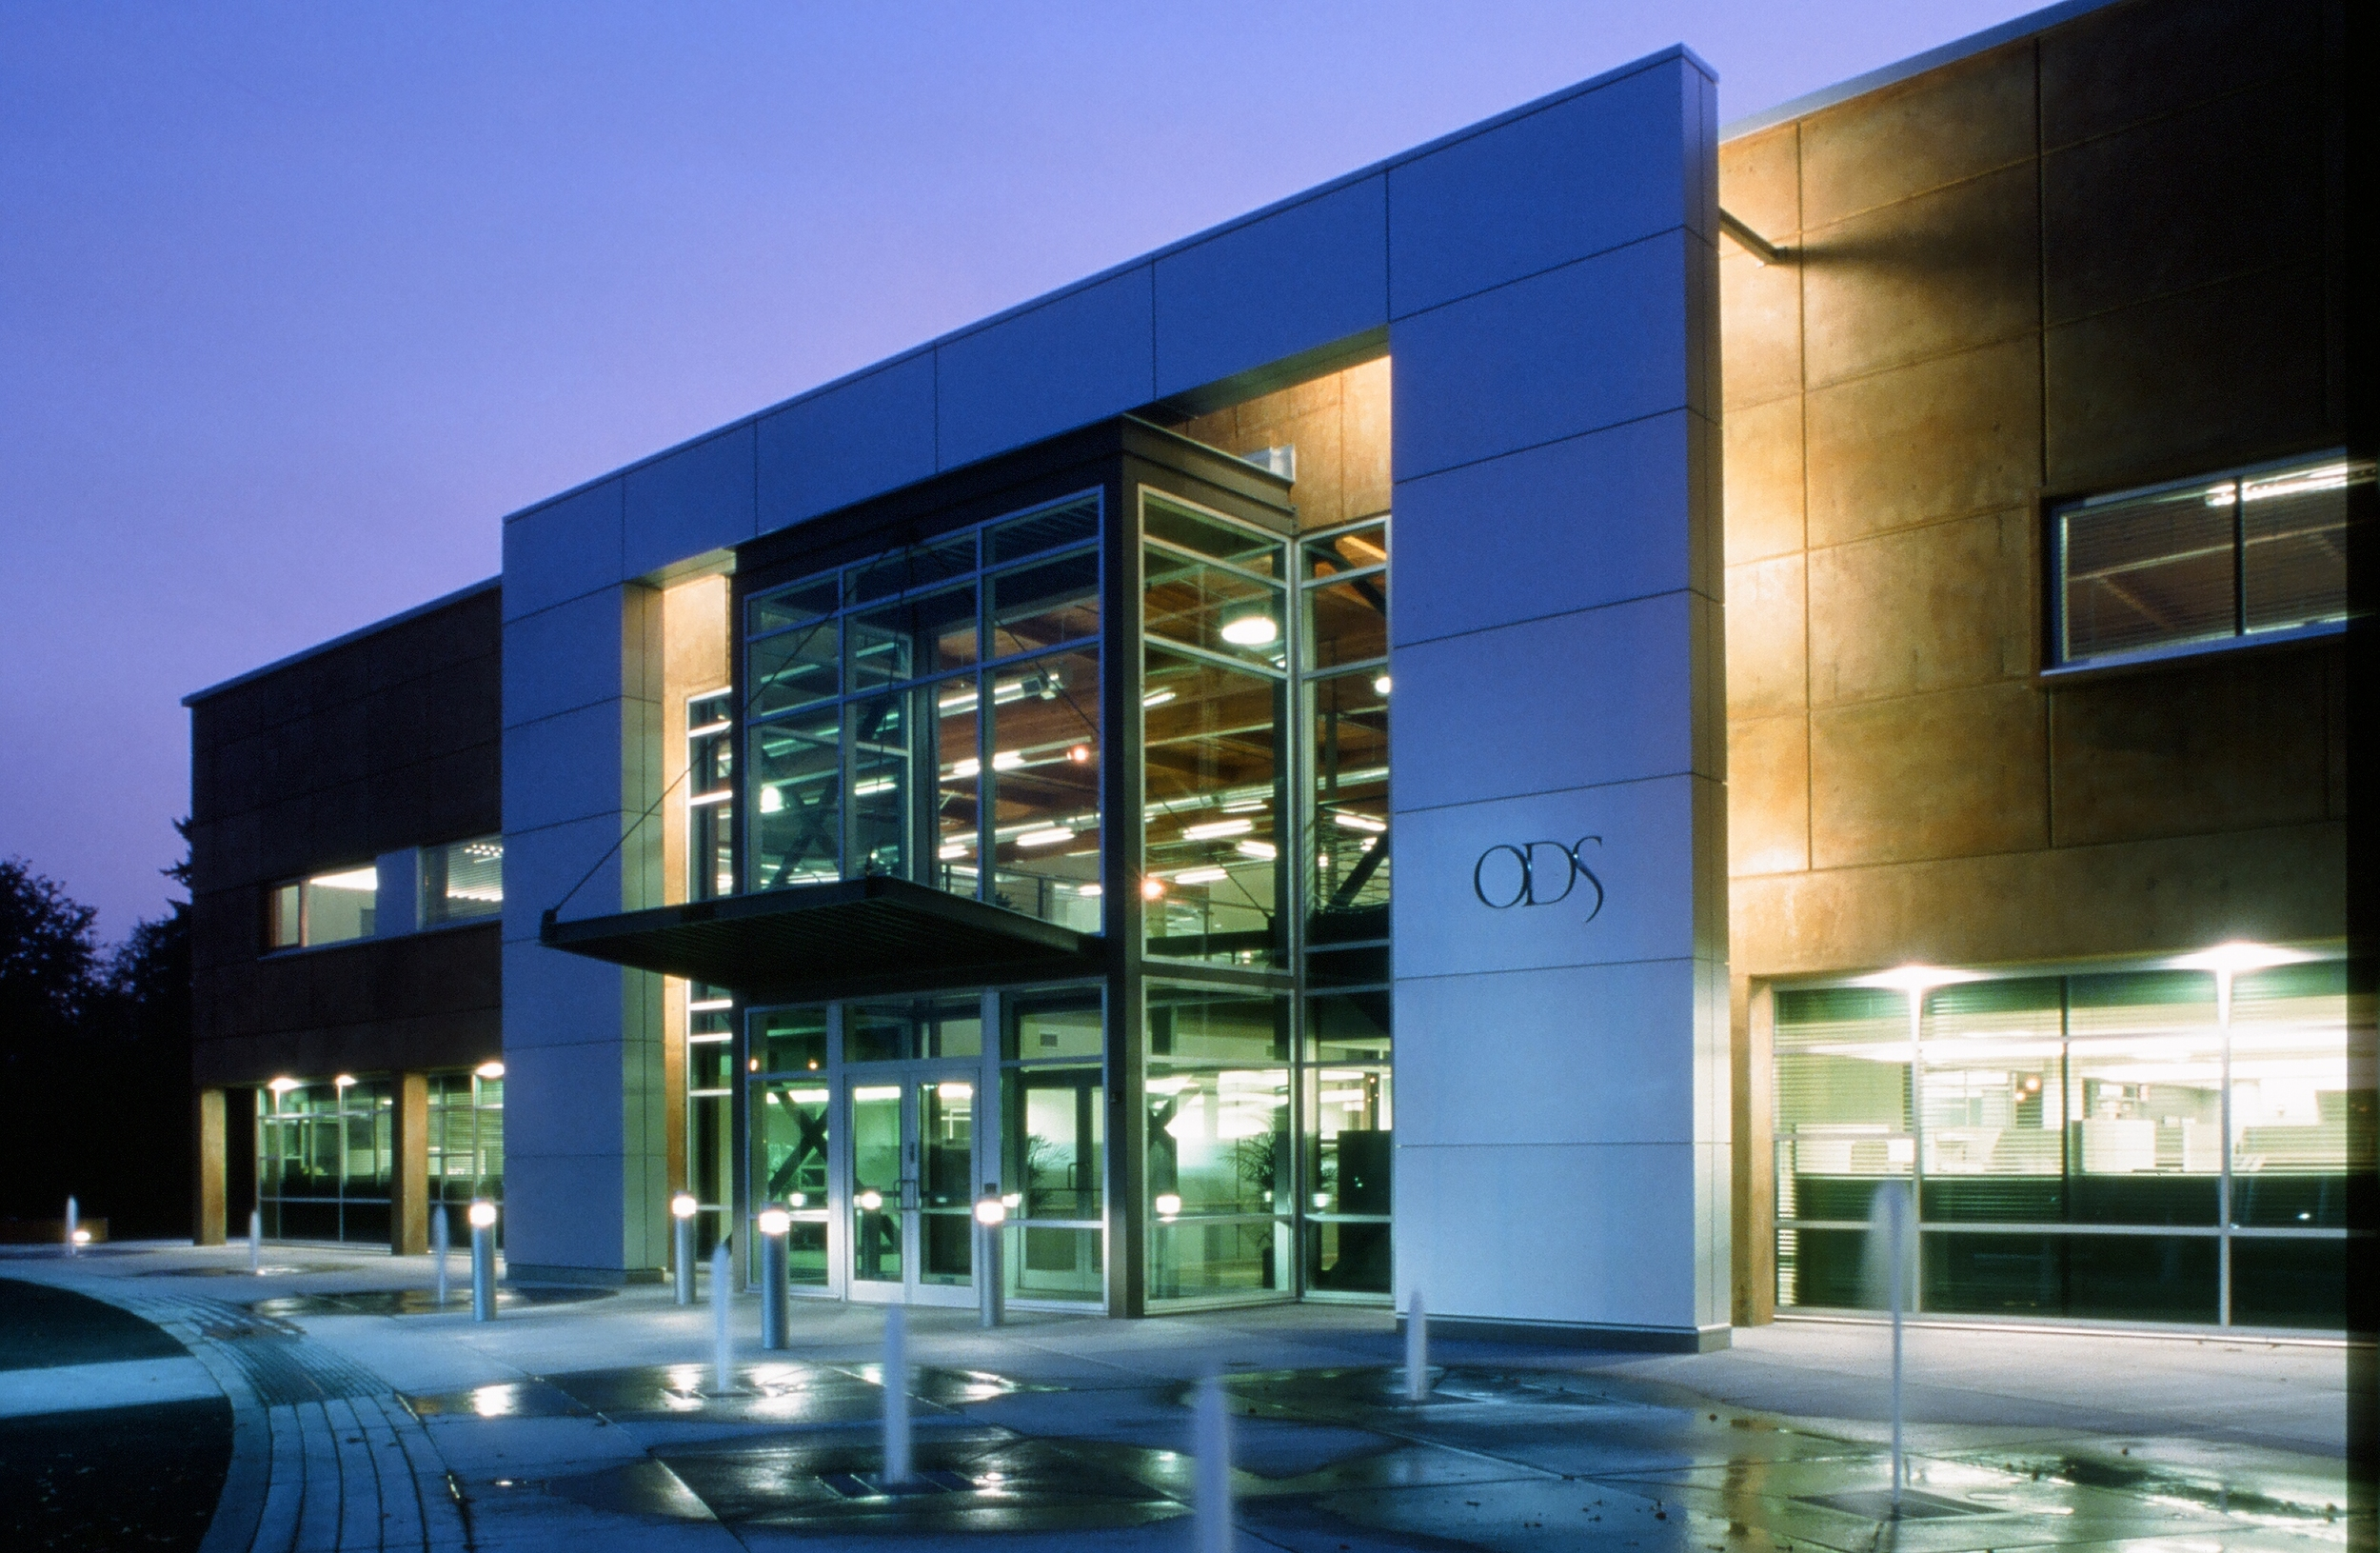 ODS Office Building